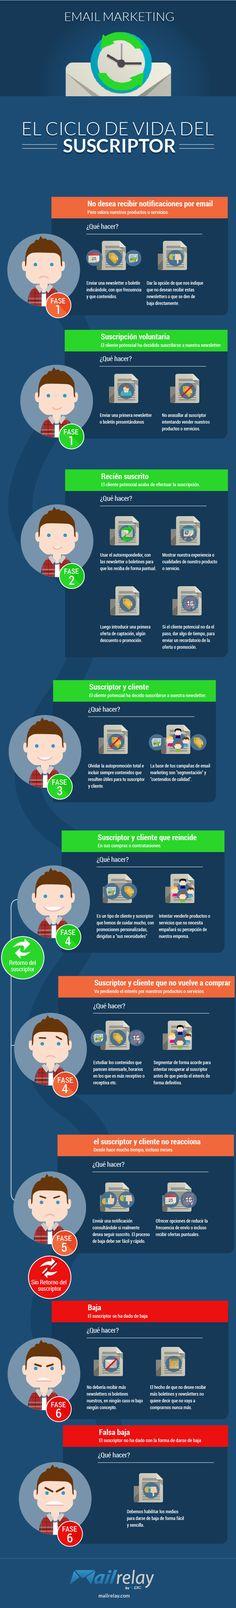 top internet marketing firms